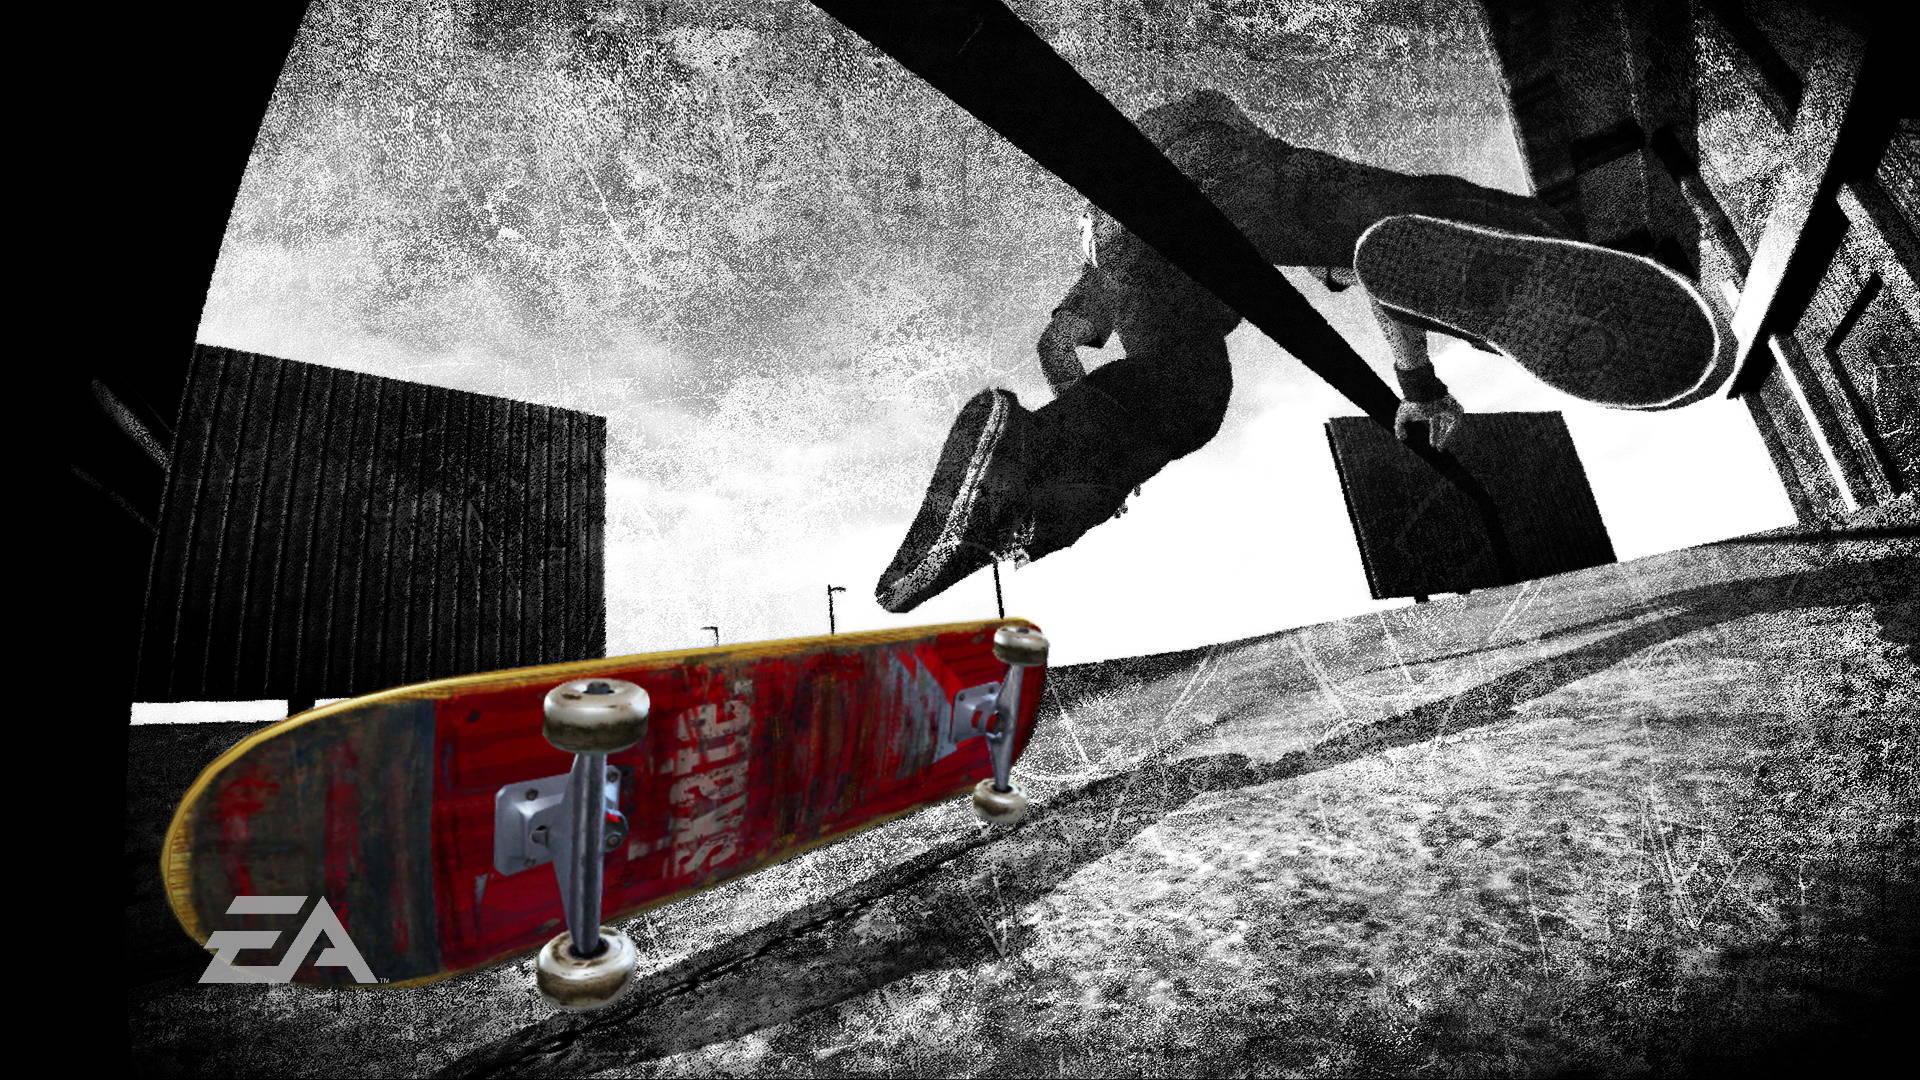 Skateboarding Cool Kid